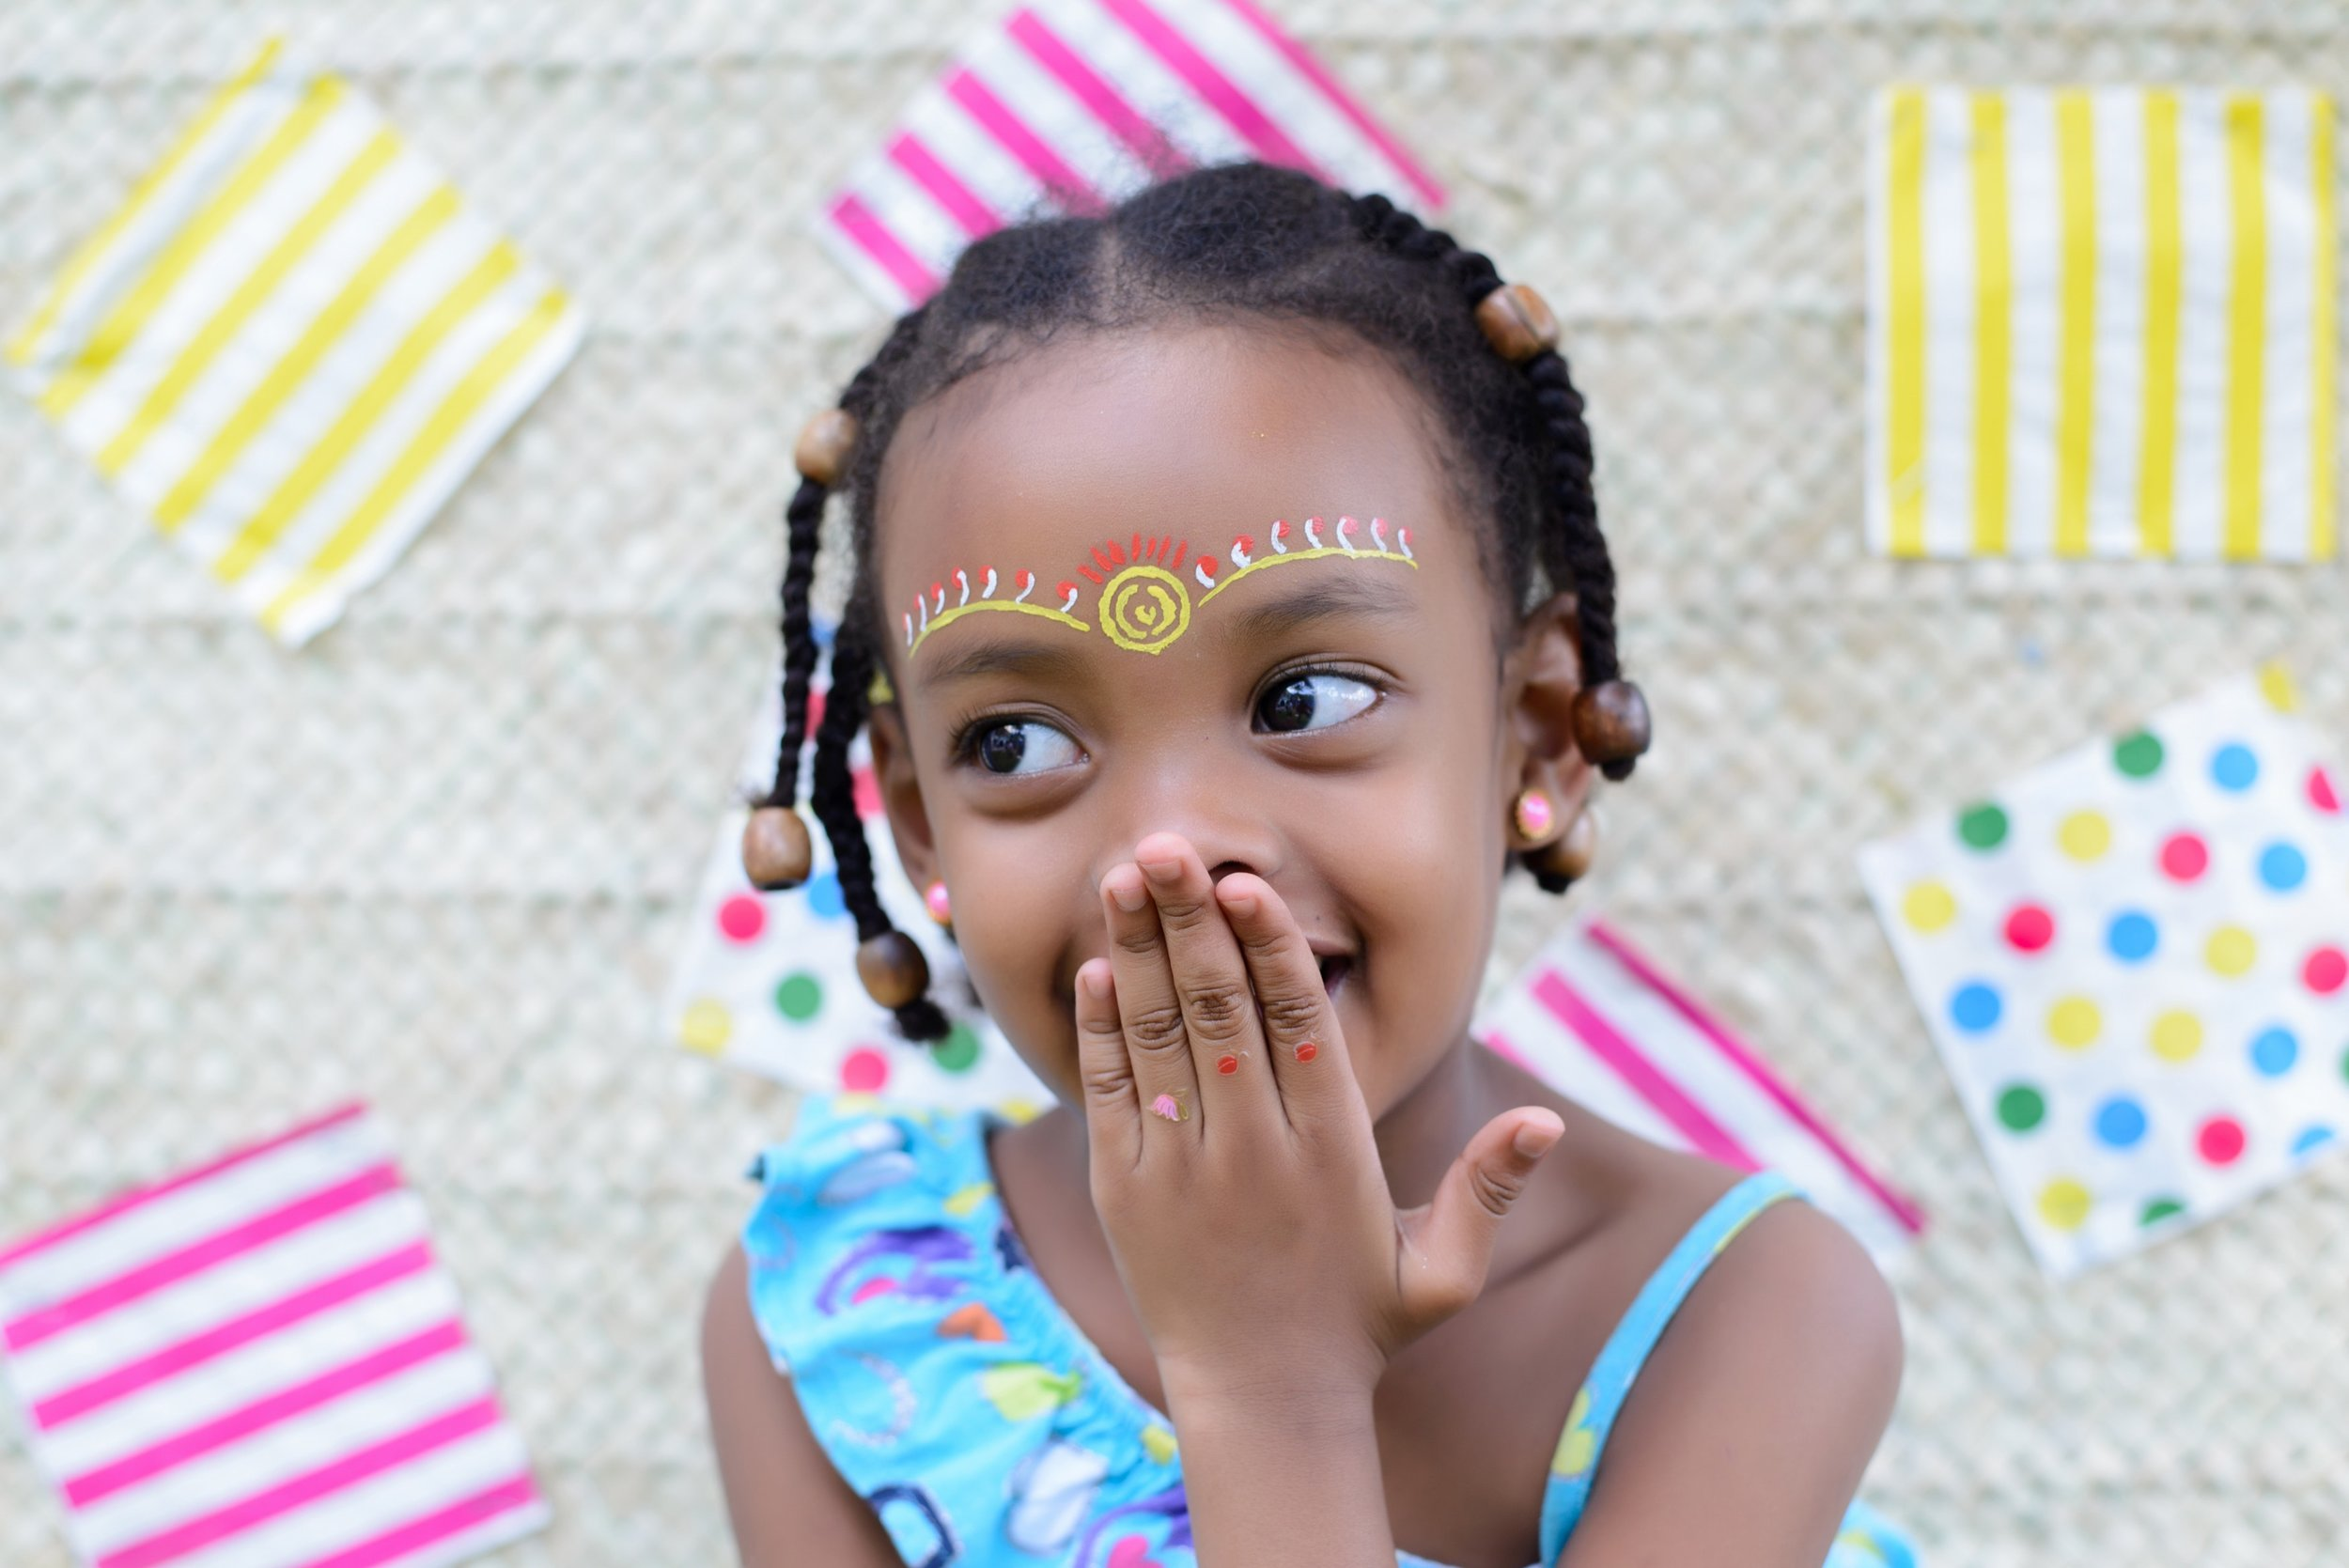 adorable-child-childhood-1445465.jpg